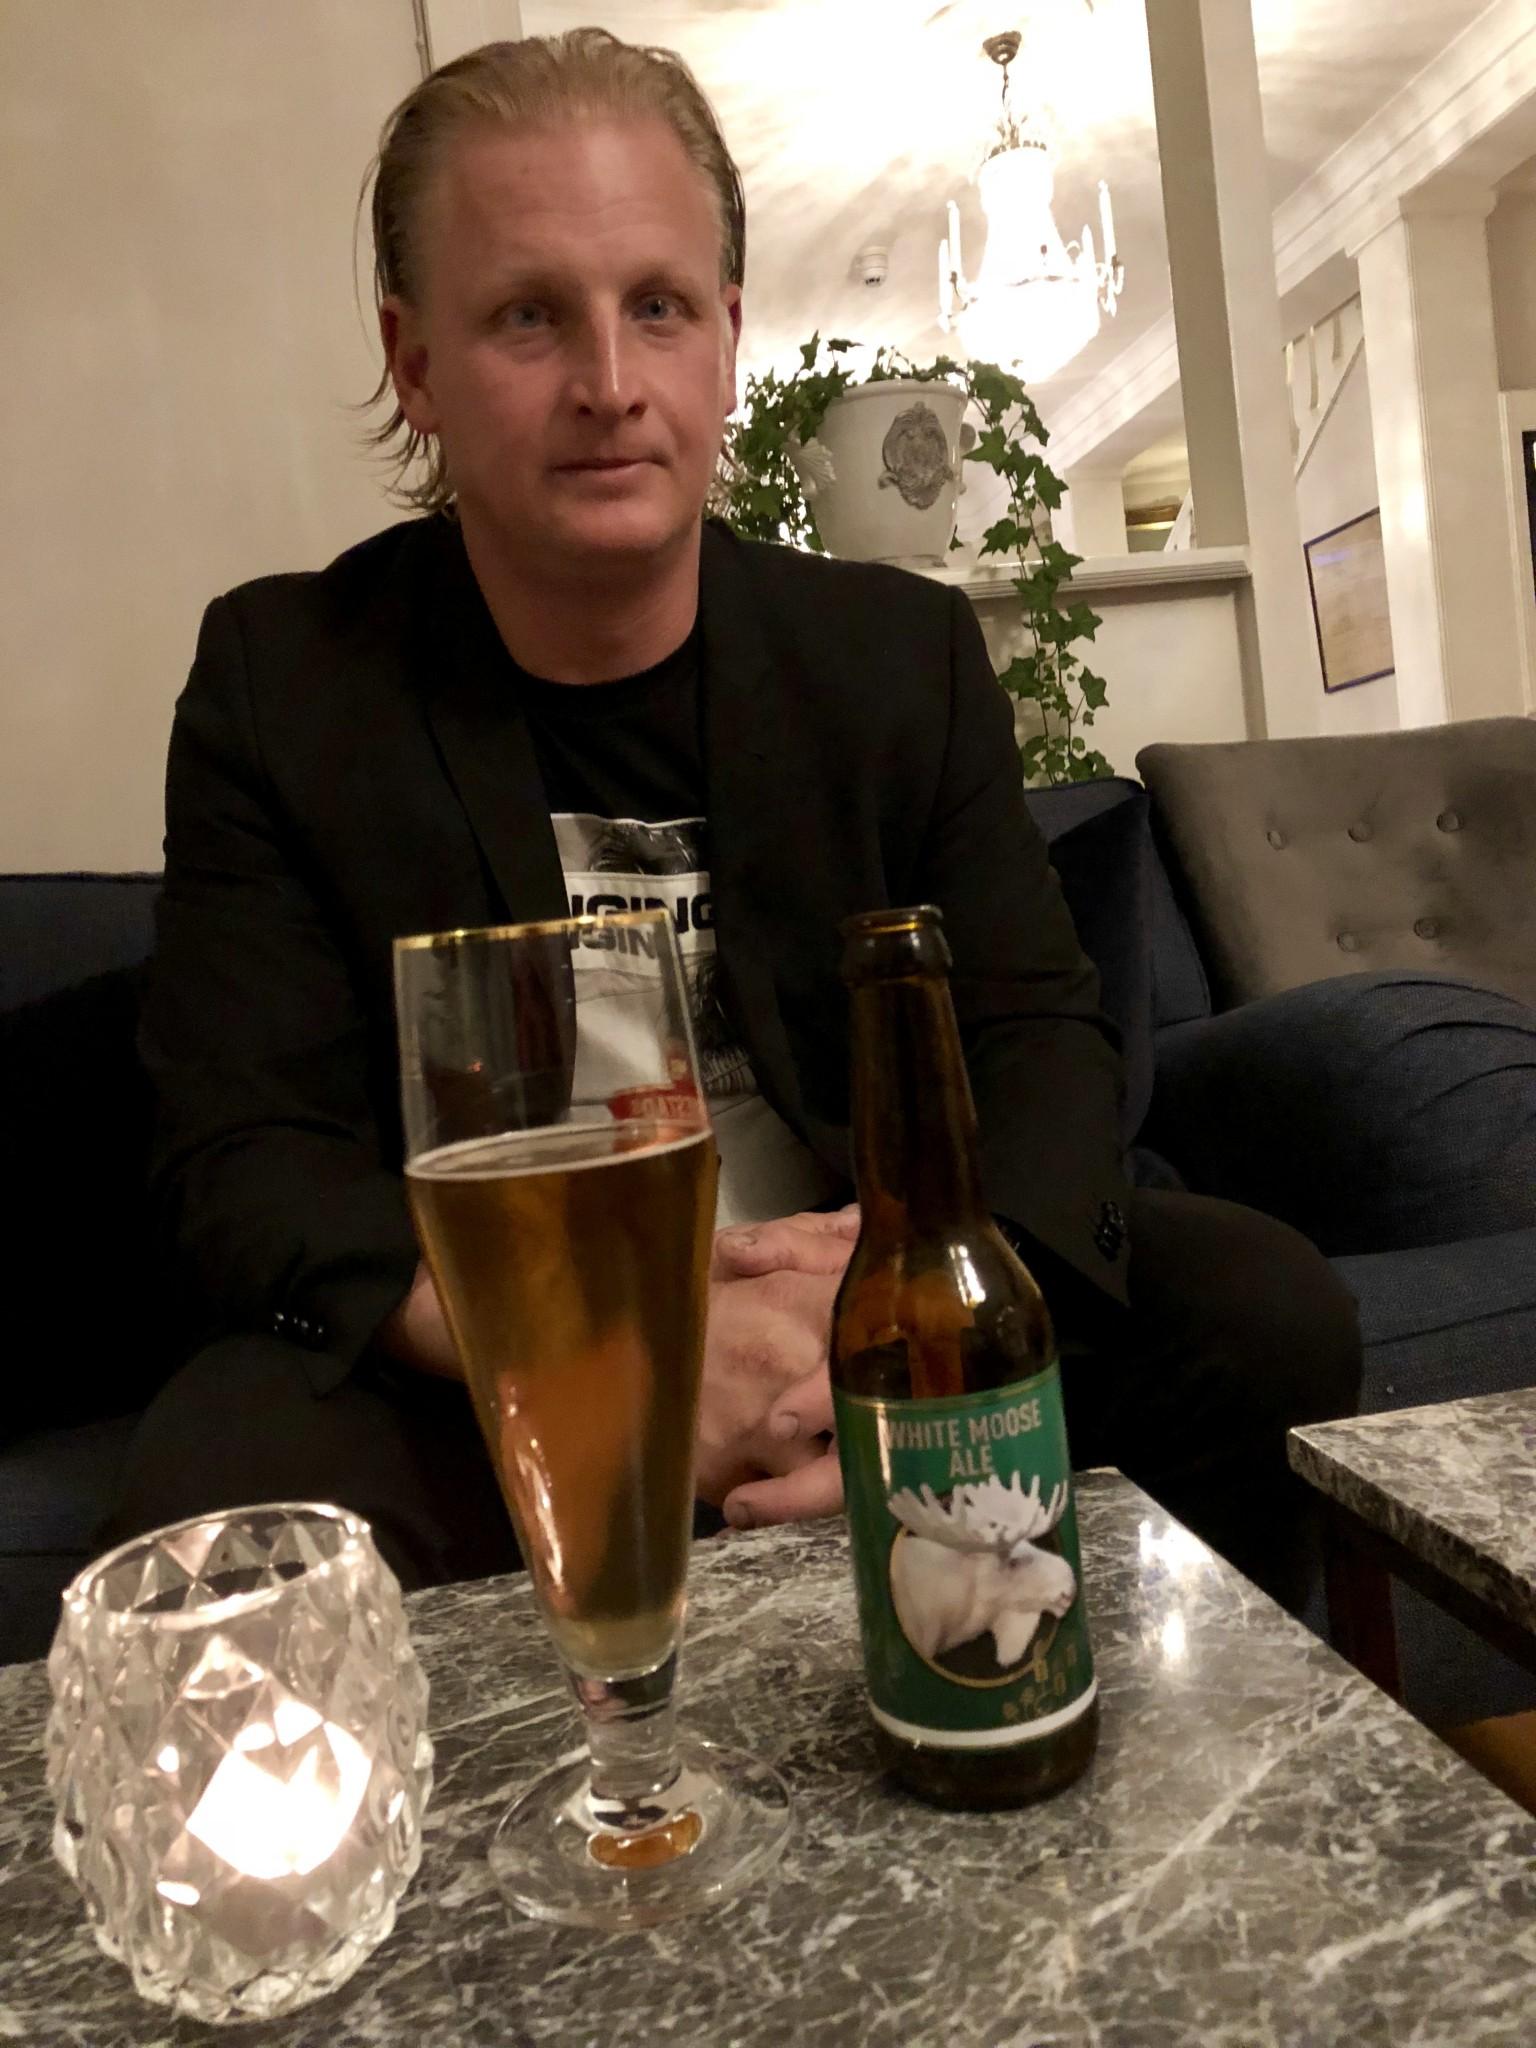 dömle beer